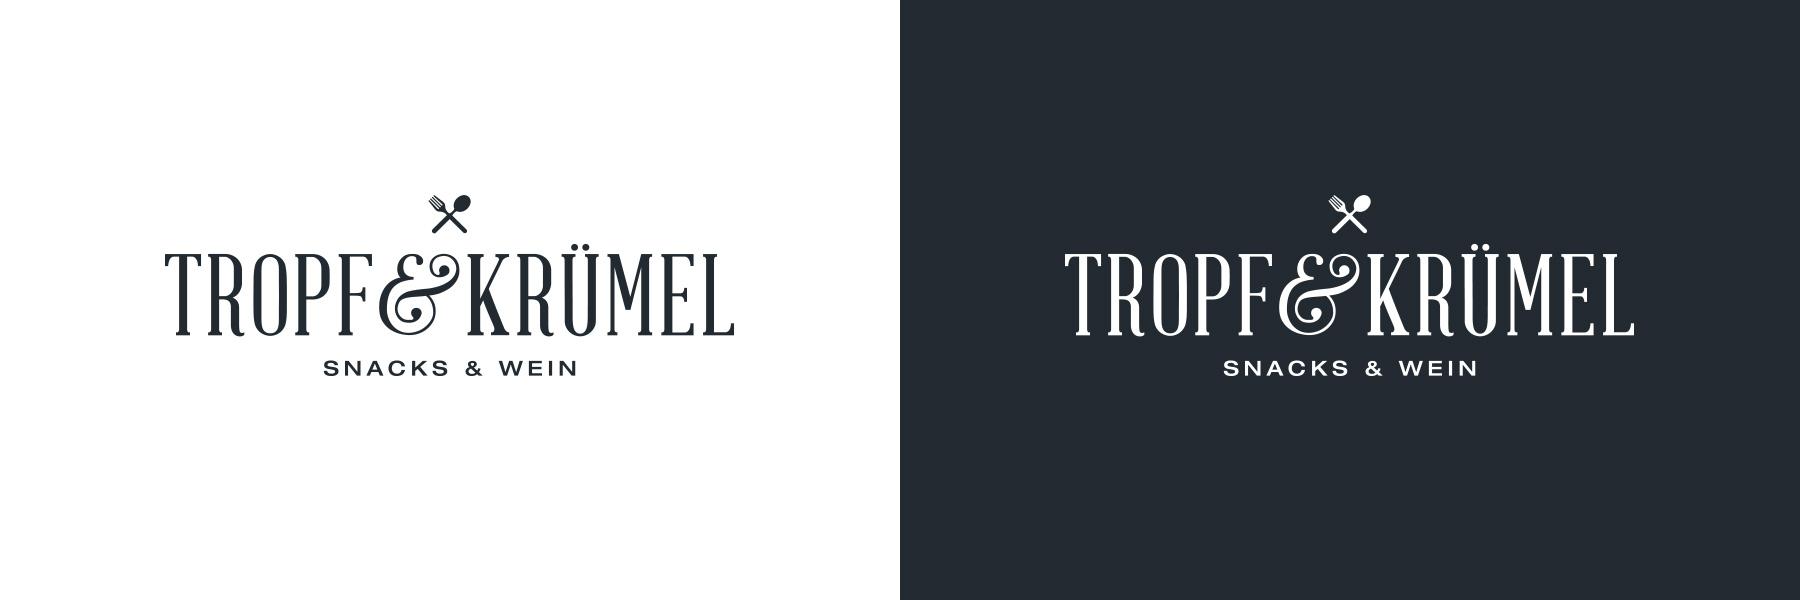 Tropf & Krümel